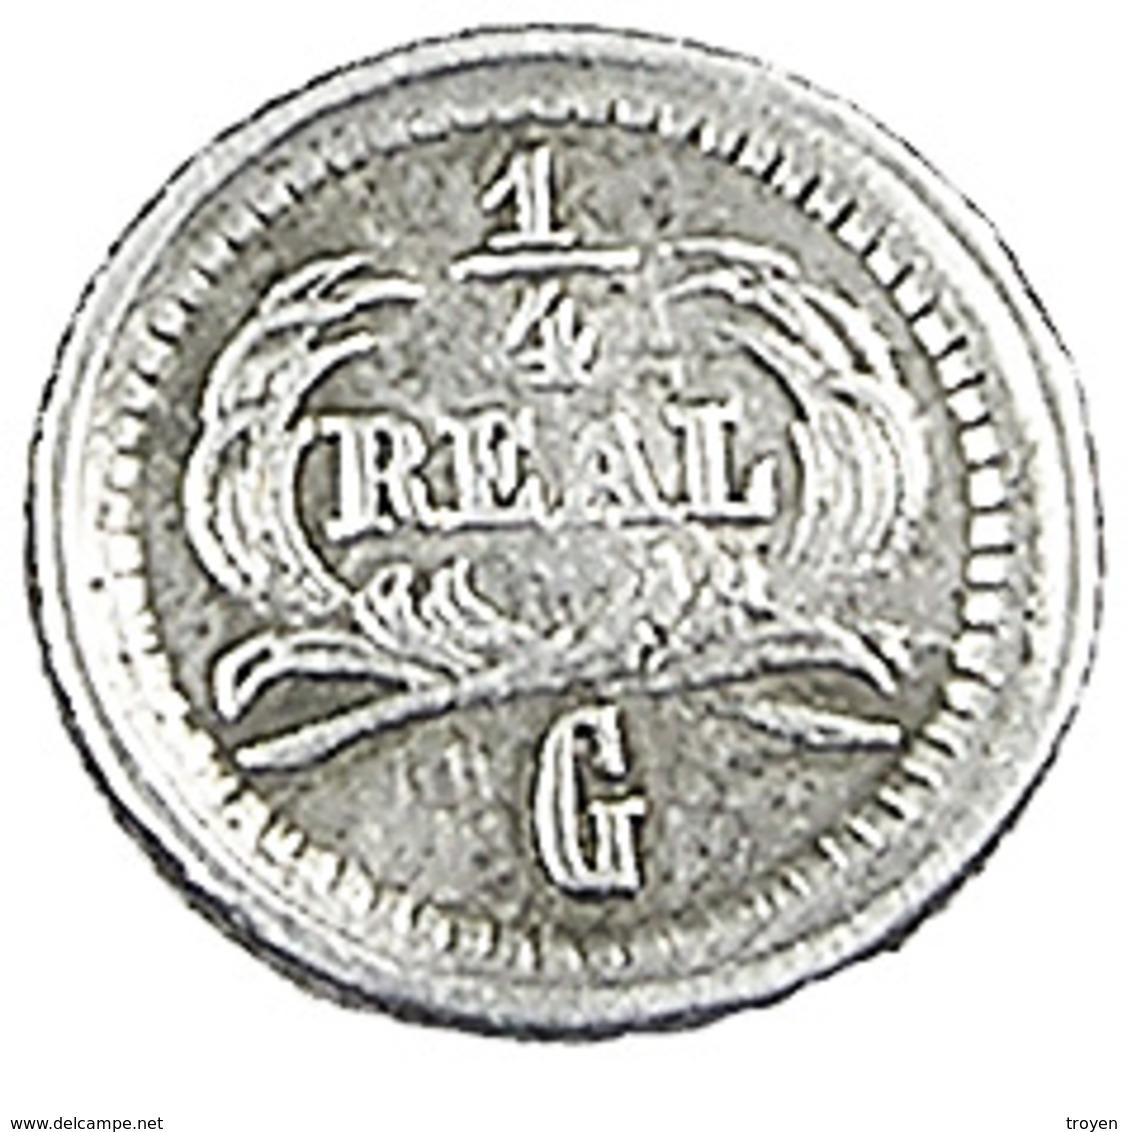 1/4 Réal - Guatemala - 1878 - Grand G  - Argent -   TTB - - Guatemala